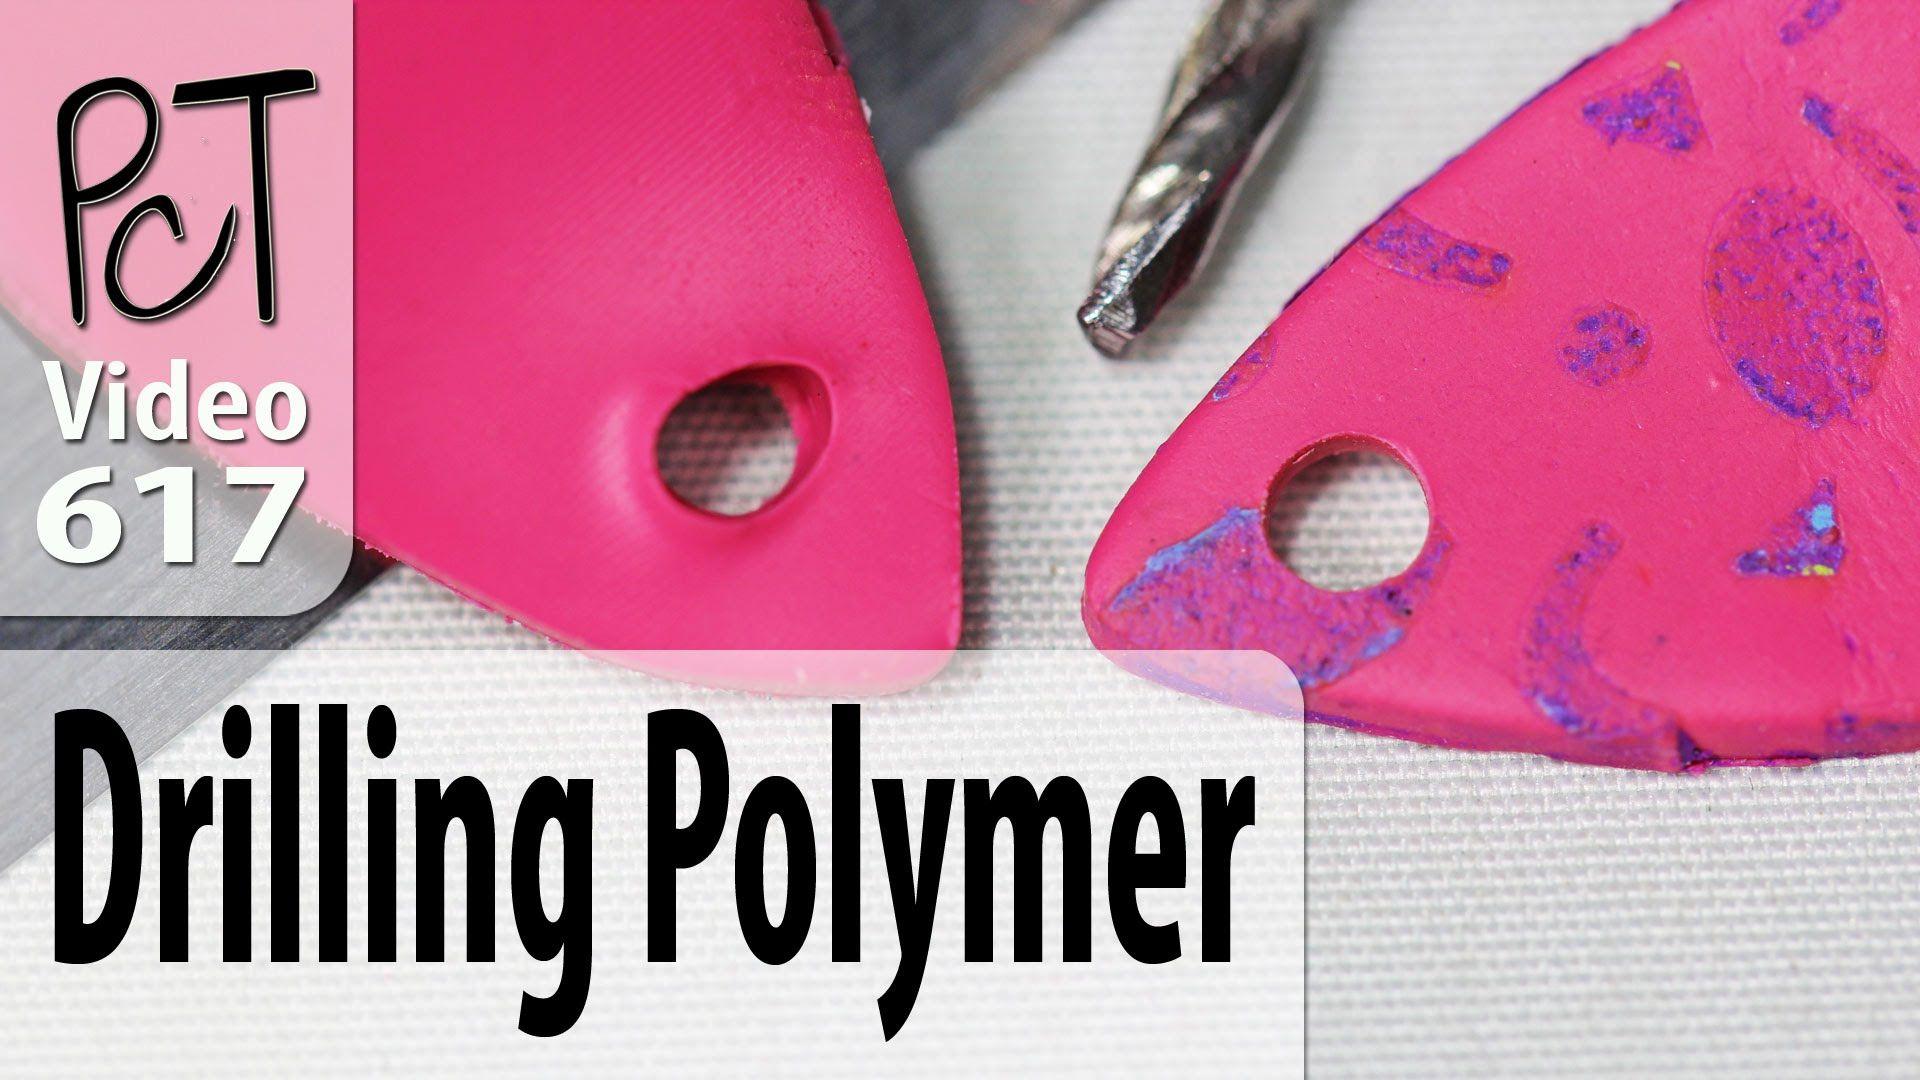 46+ Craft smart polymer clay baking information